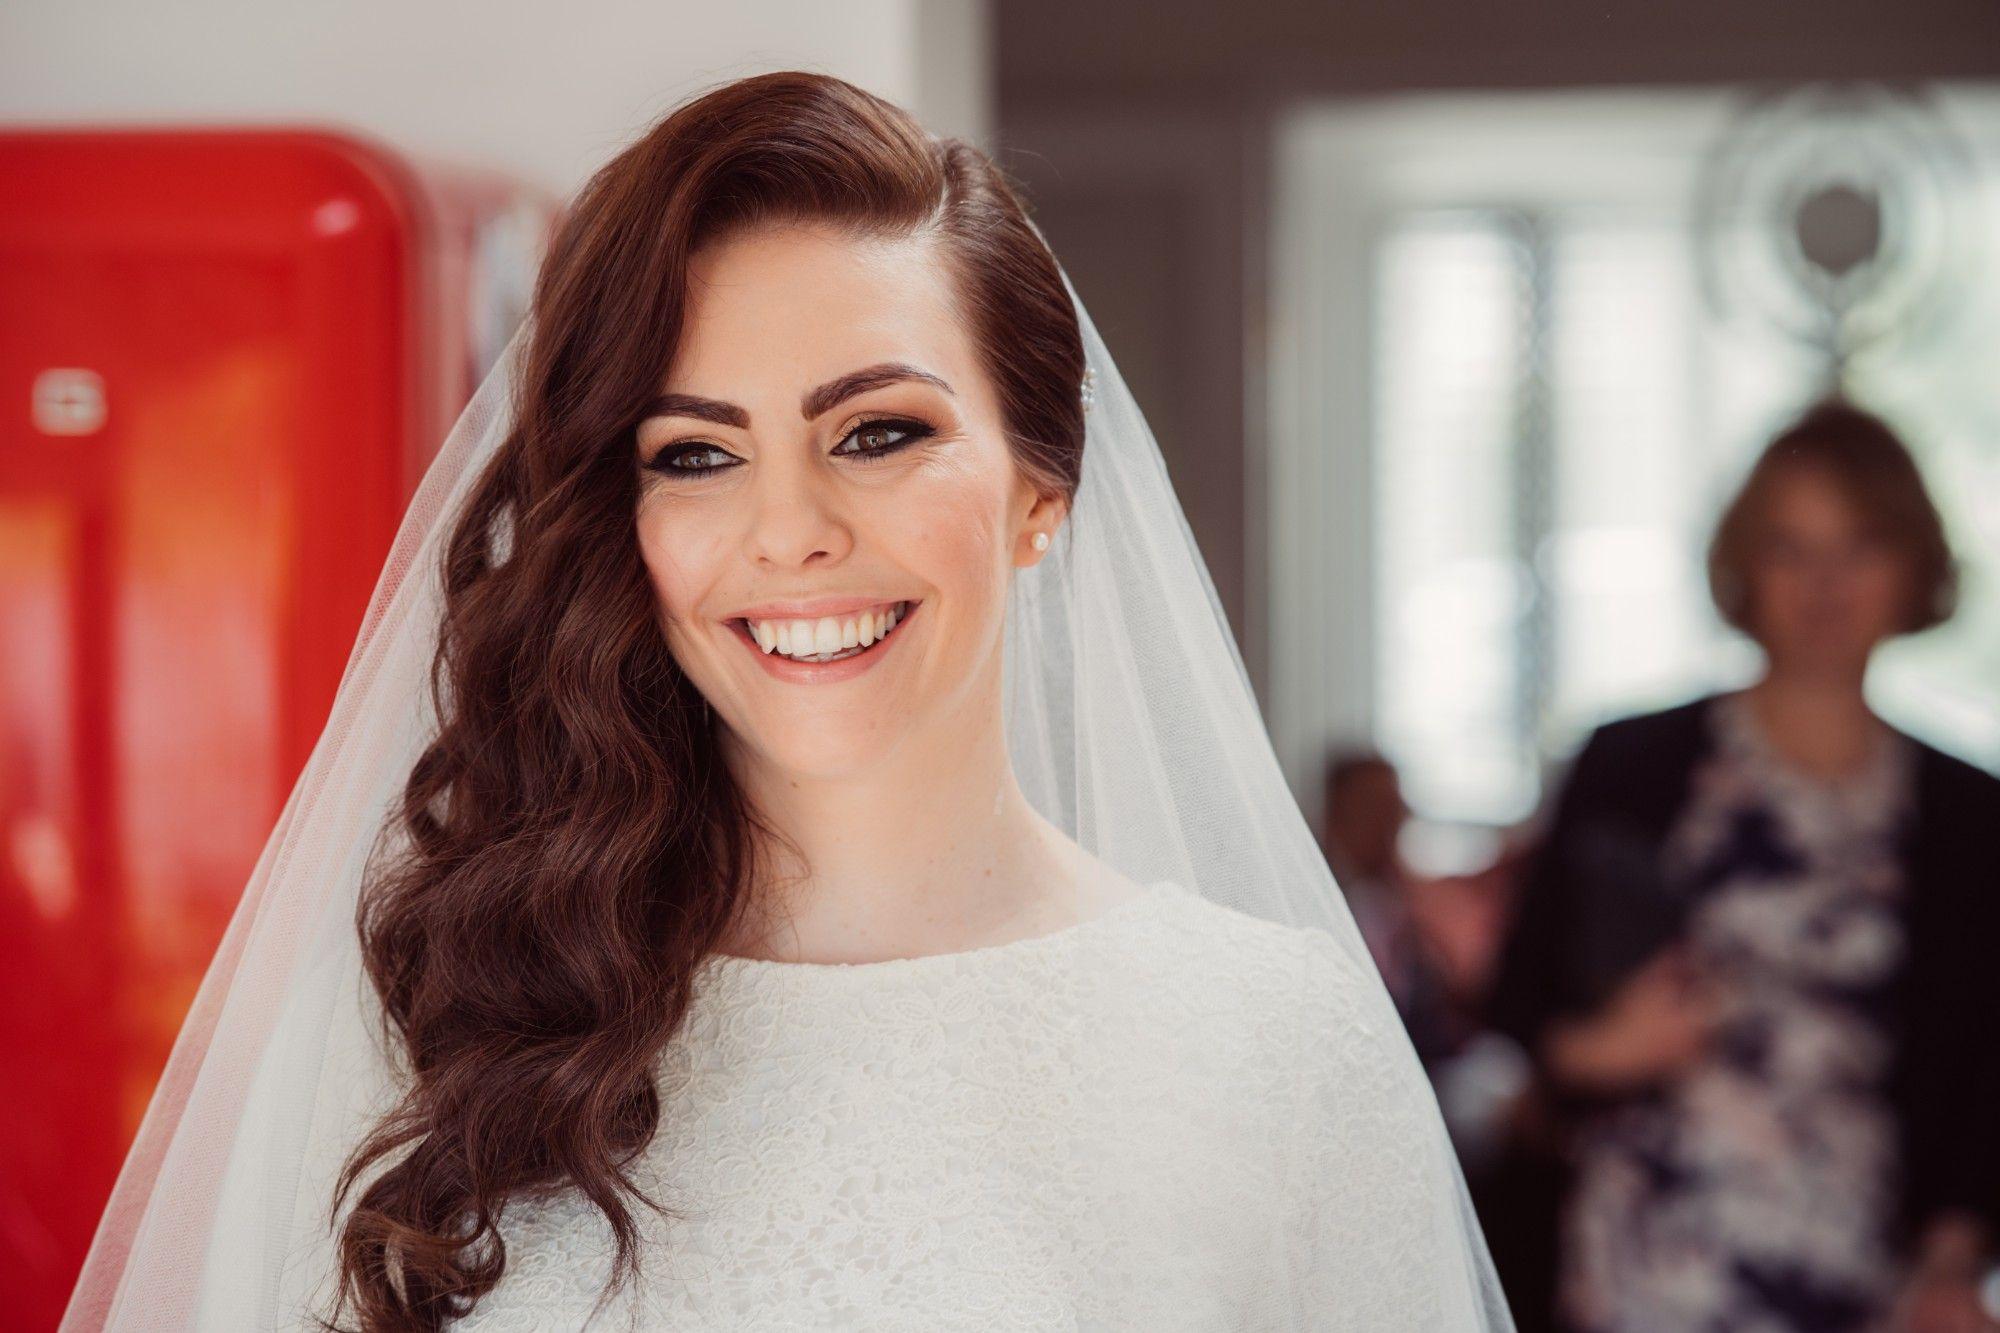 Bridal-wedding-hair-stylist-Tetbury-Gloucestershire-UK-LL-75